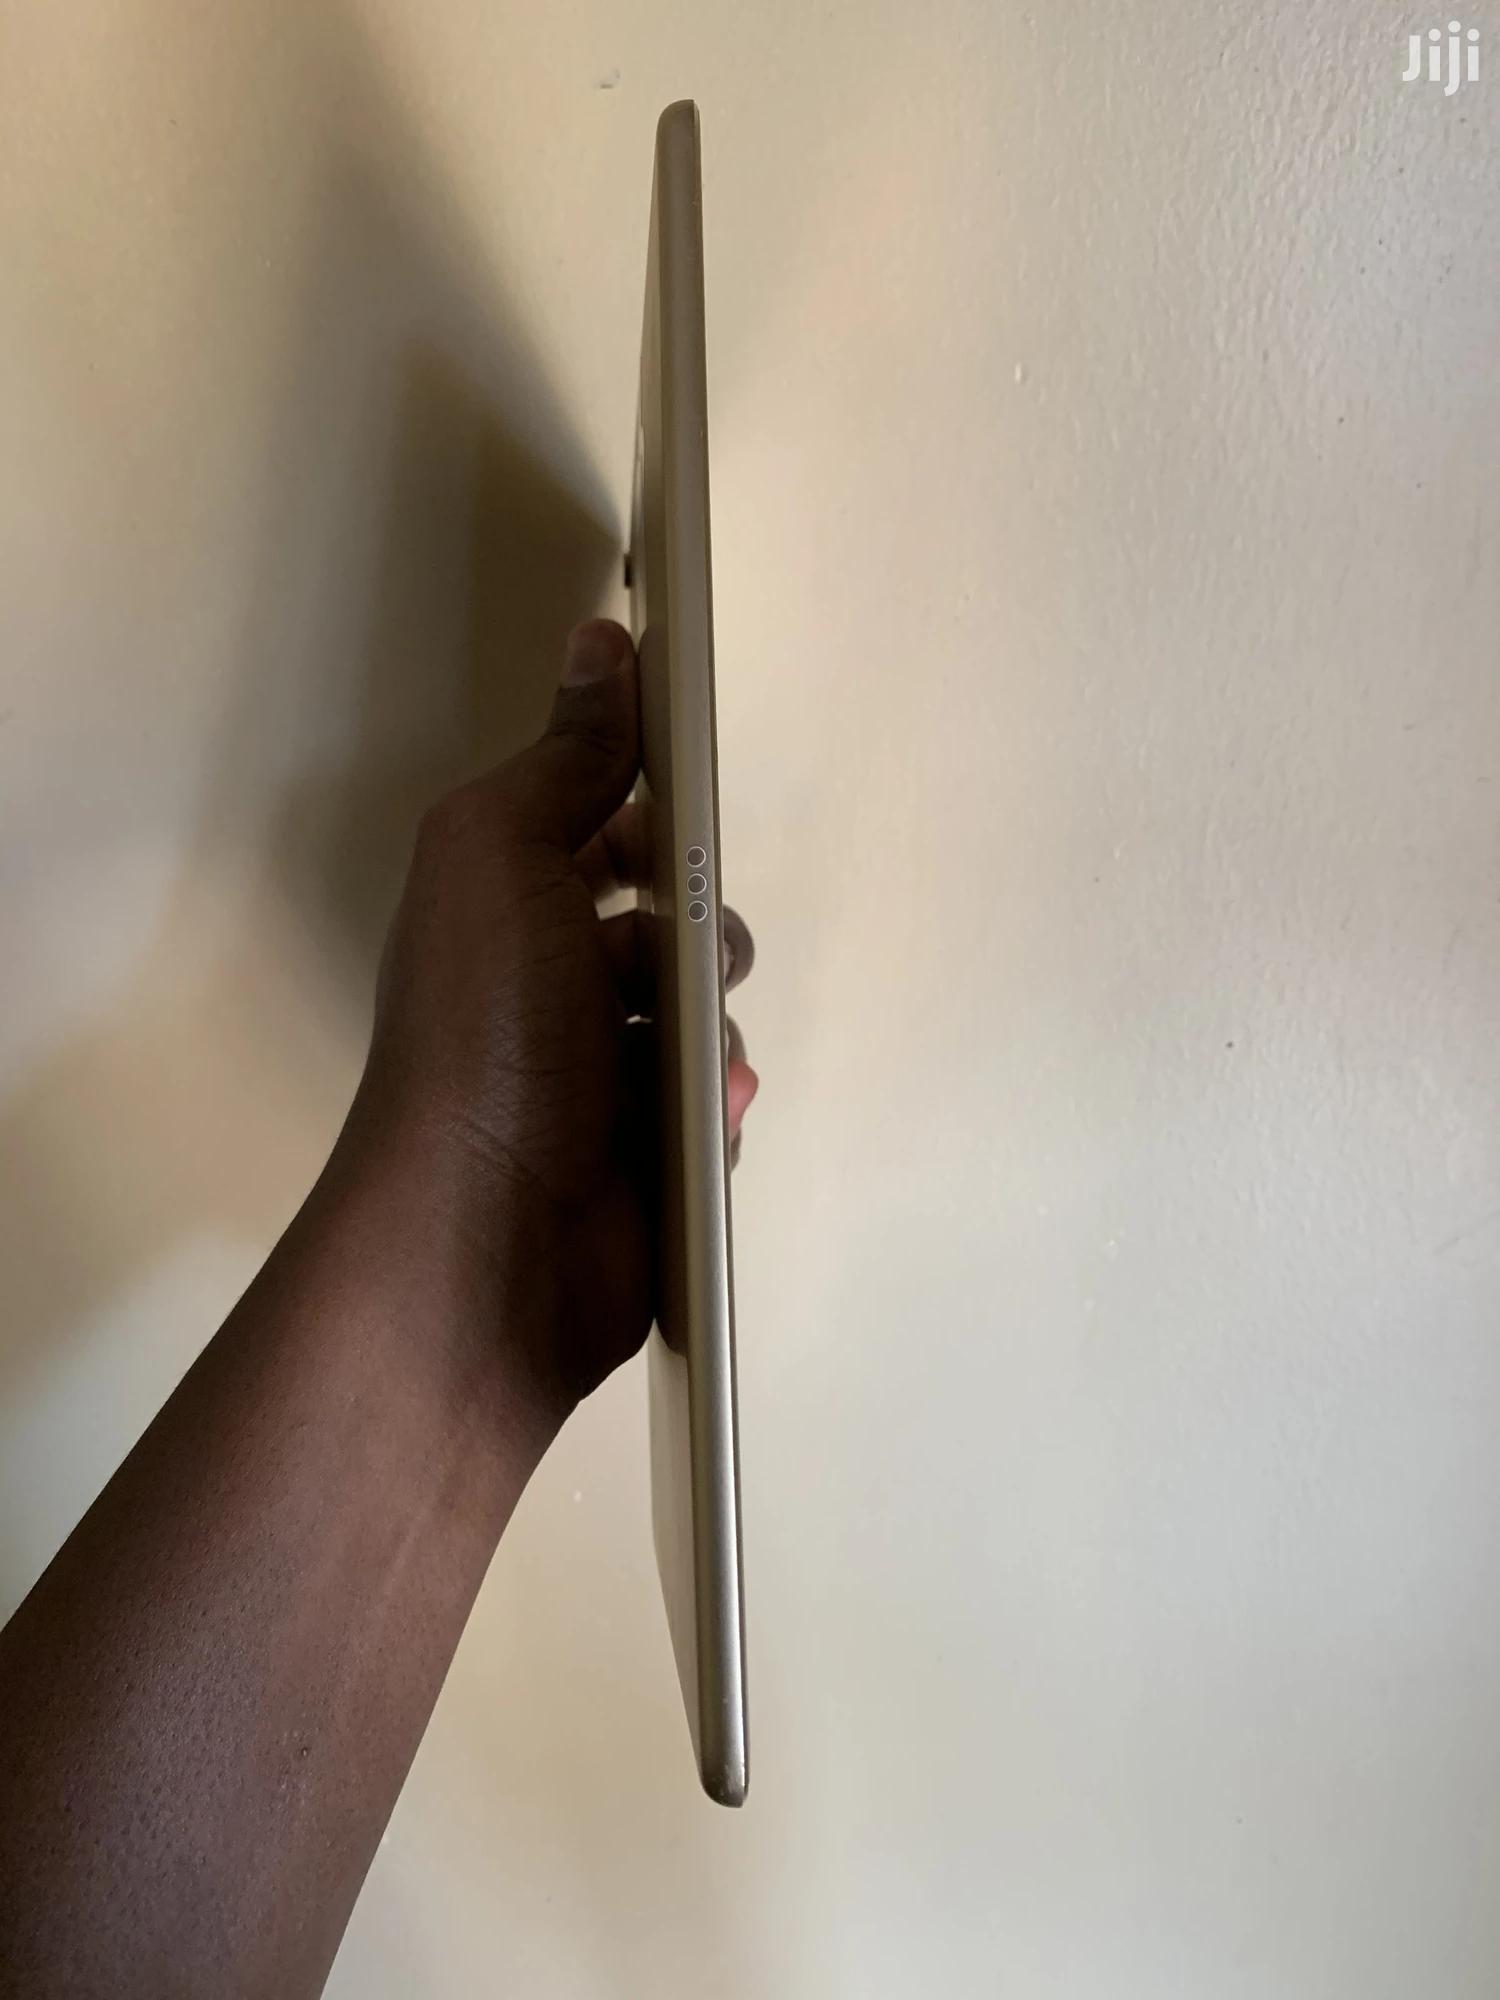 Apple iPad Pro 10.5 64 GB Silver | Tablets for sale in Kampala, Central Region, Uganda